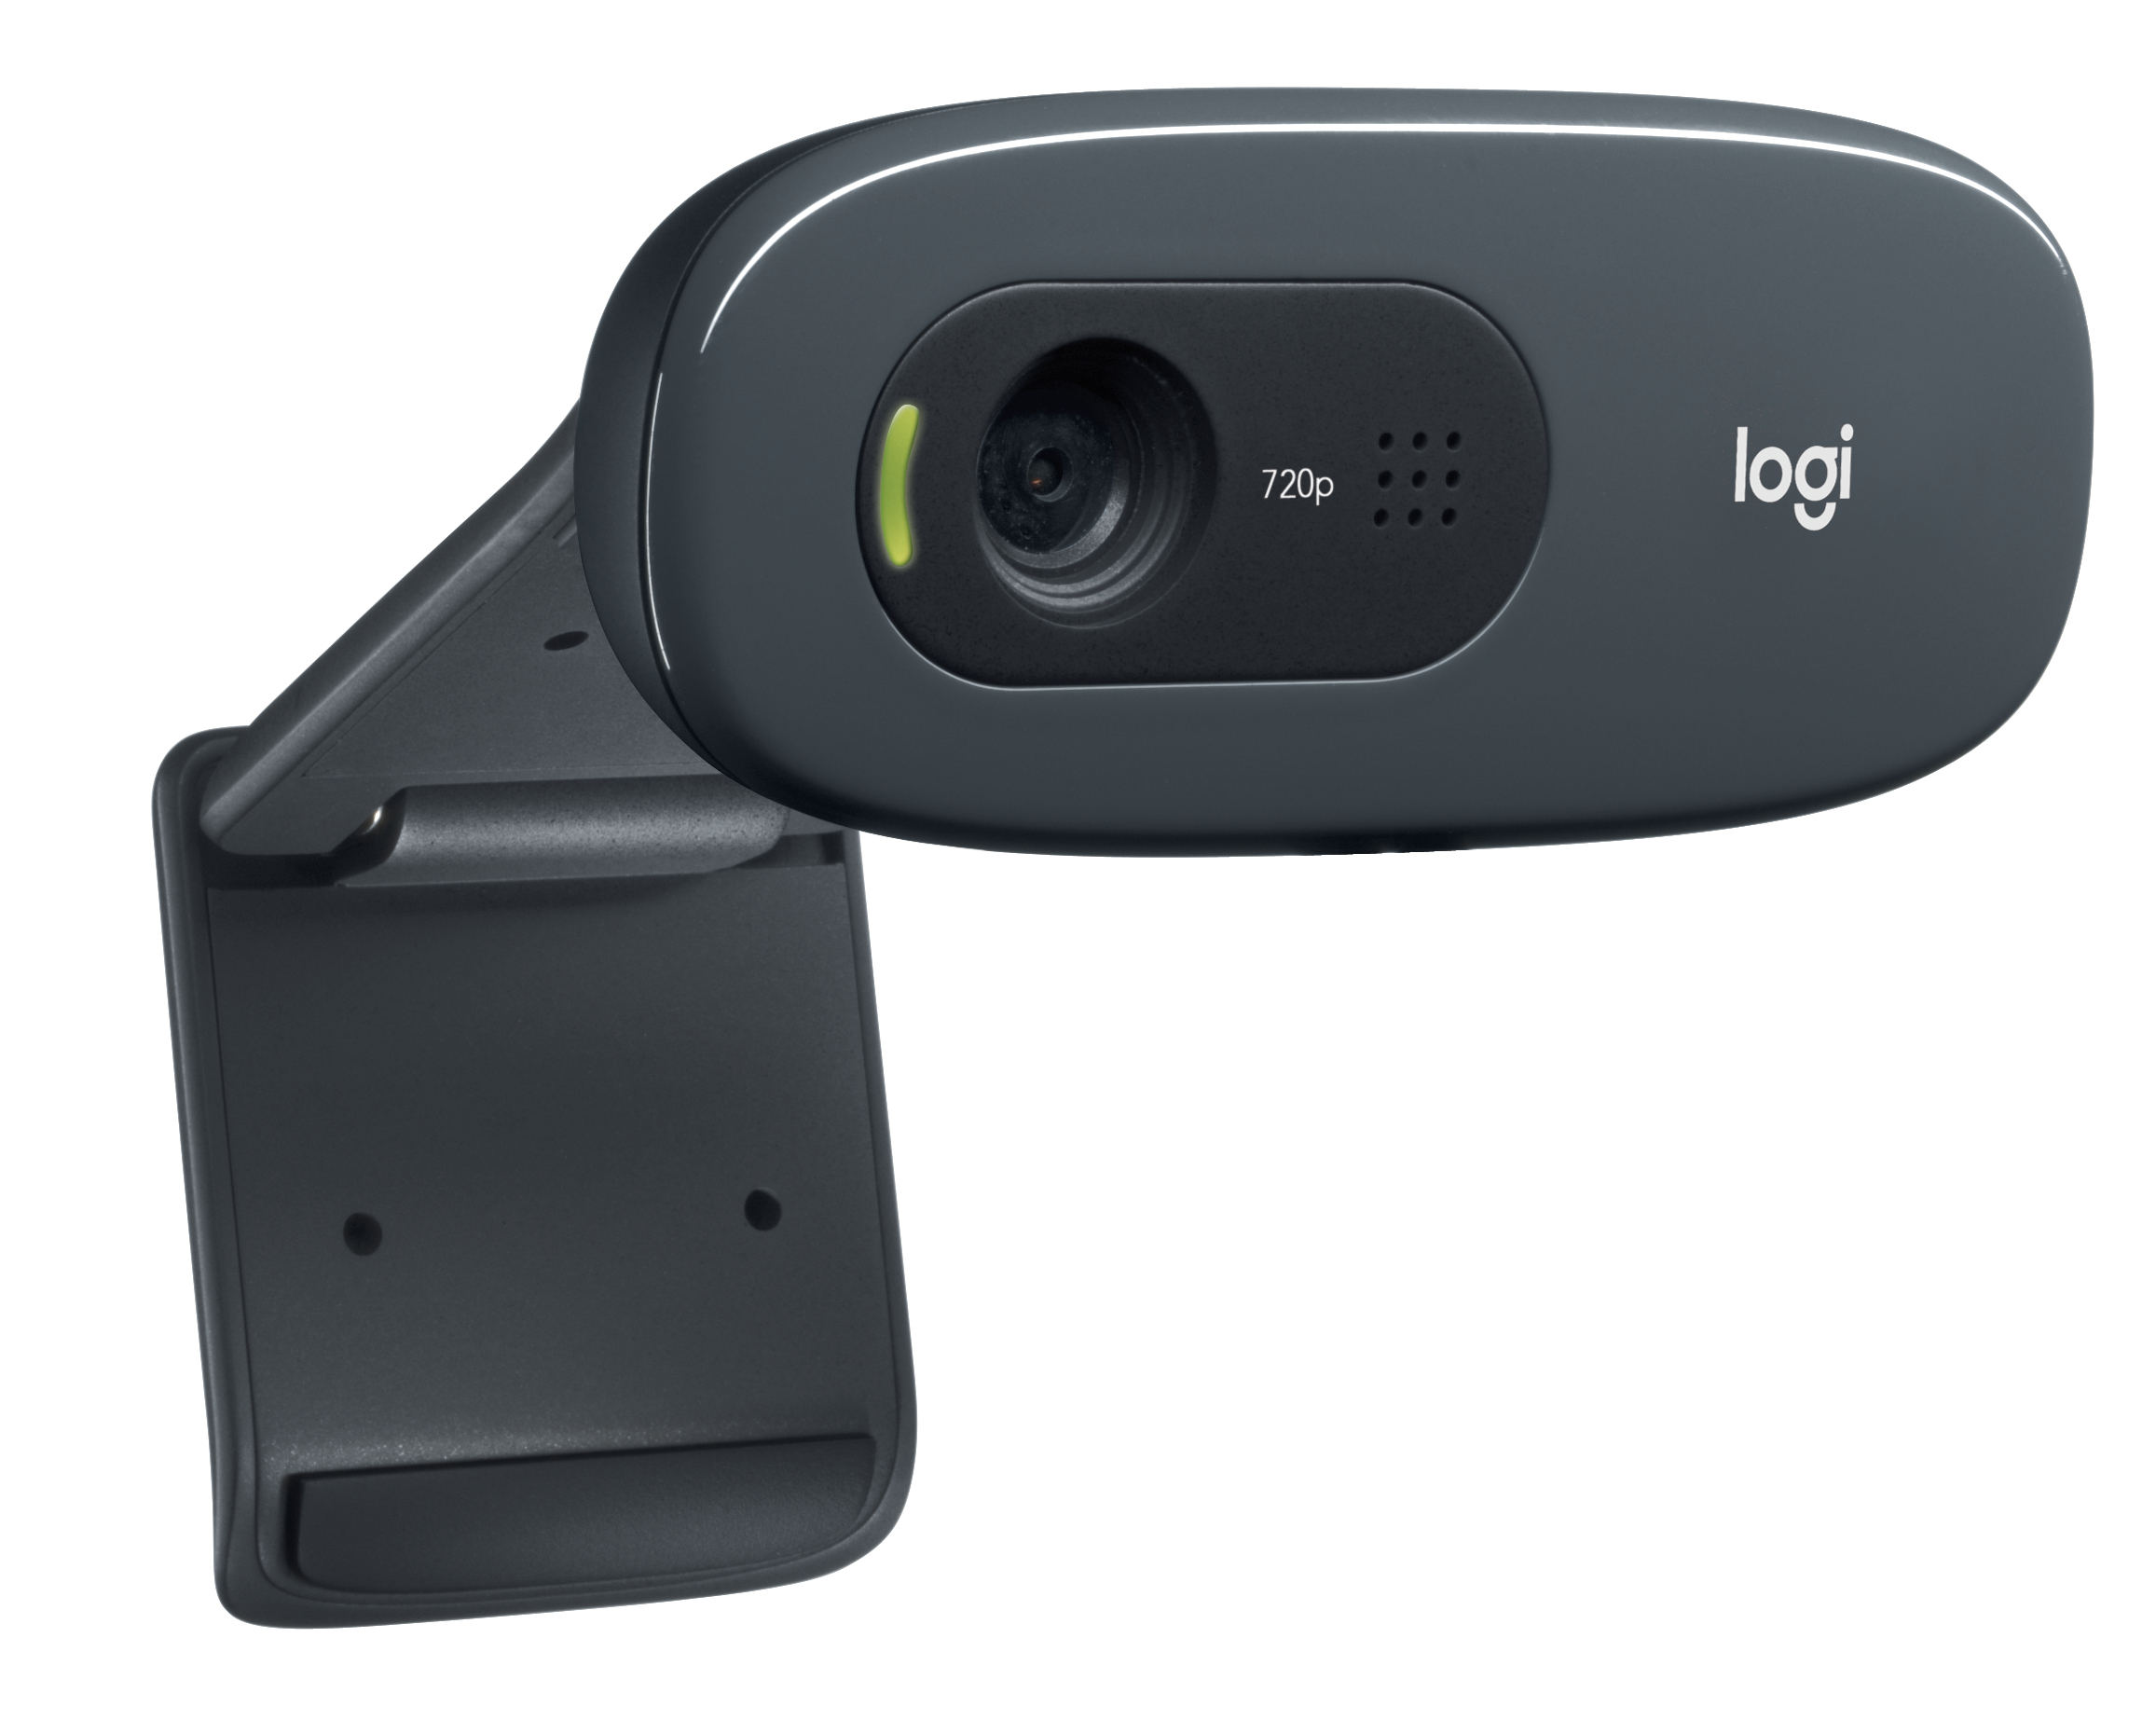 Logitech C270 HD WEBCAM All the essentials for HD 720p video calling - Walmart.com